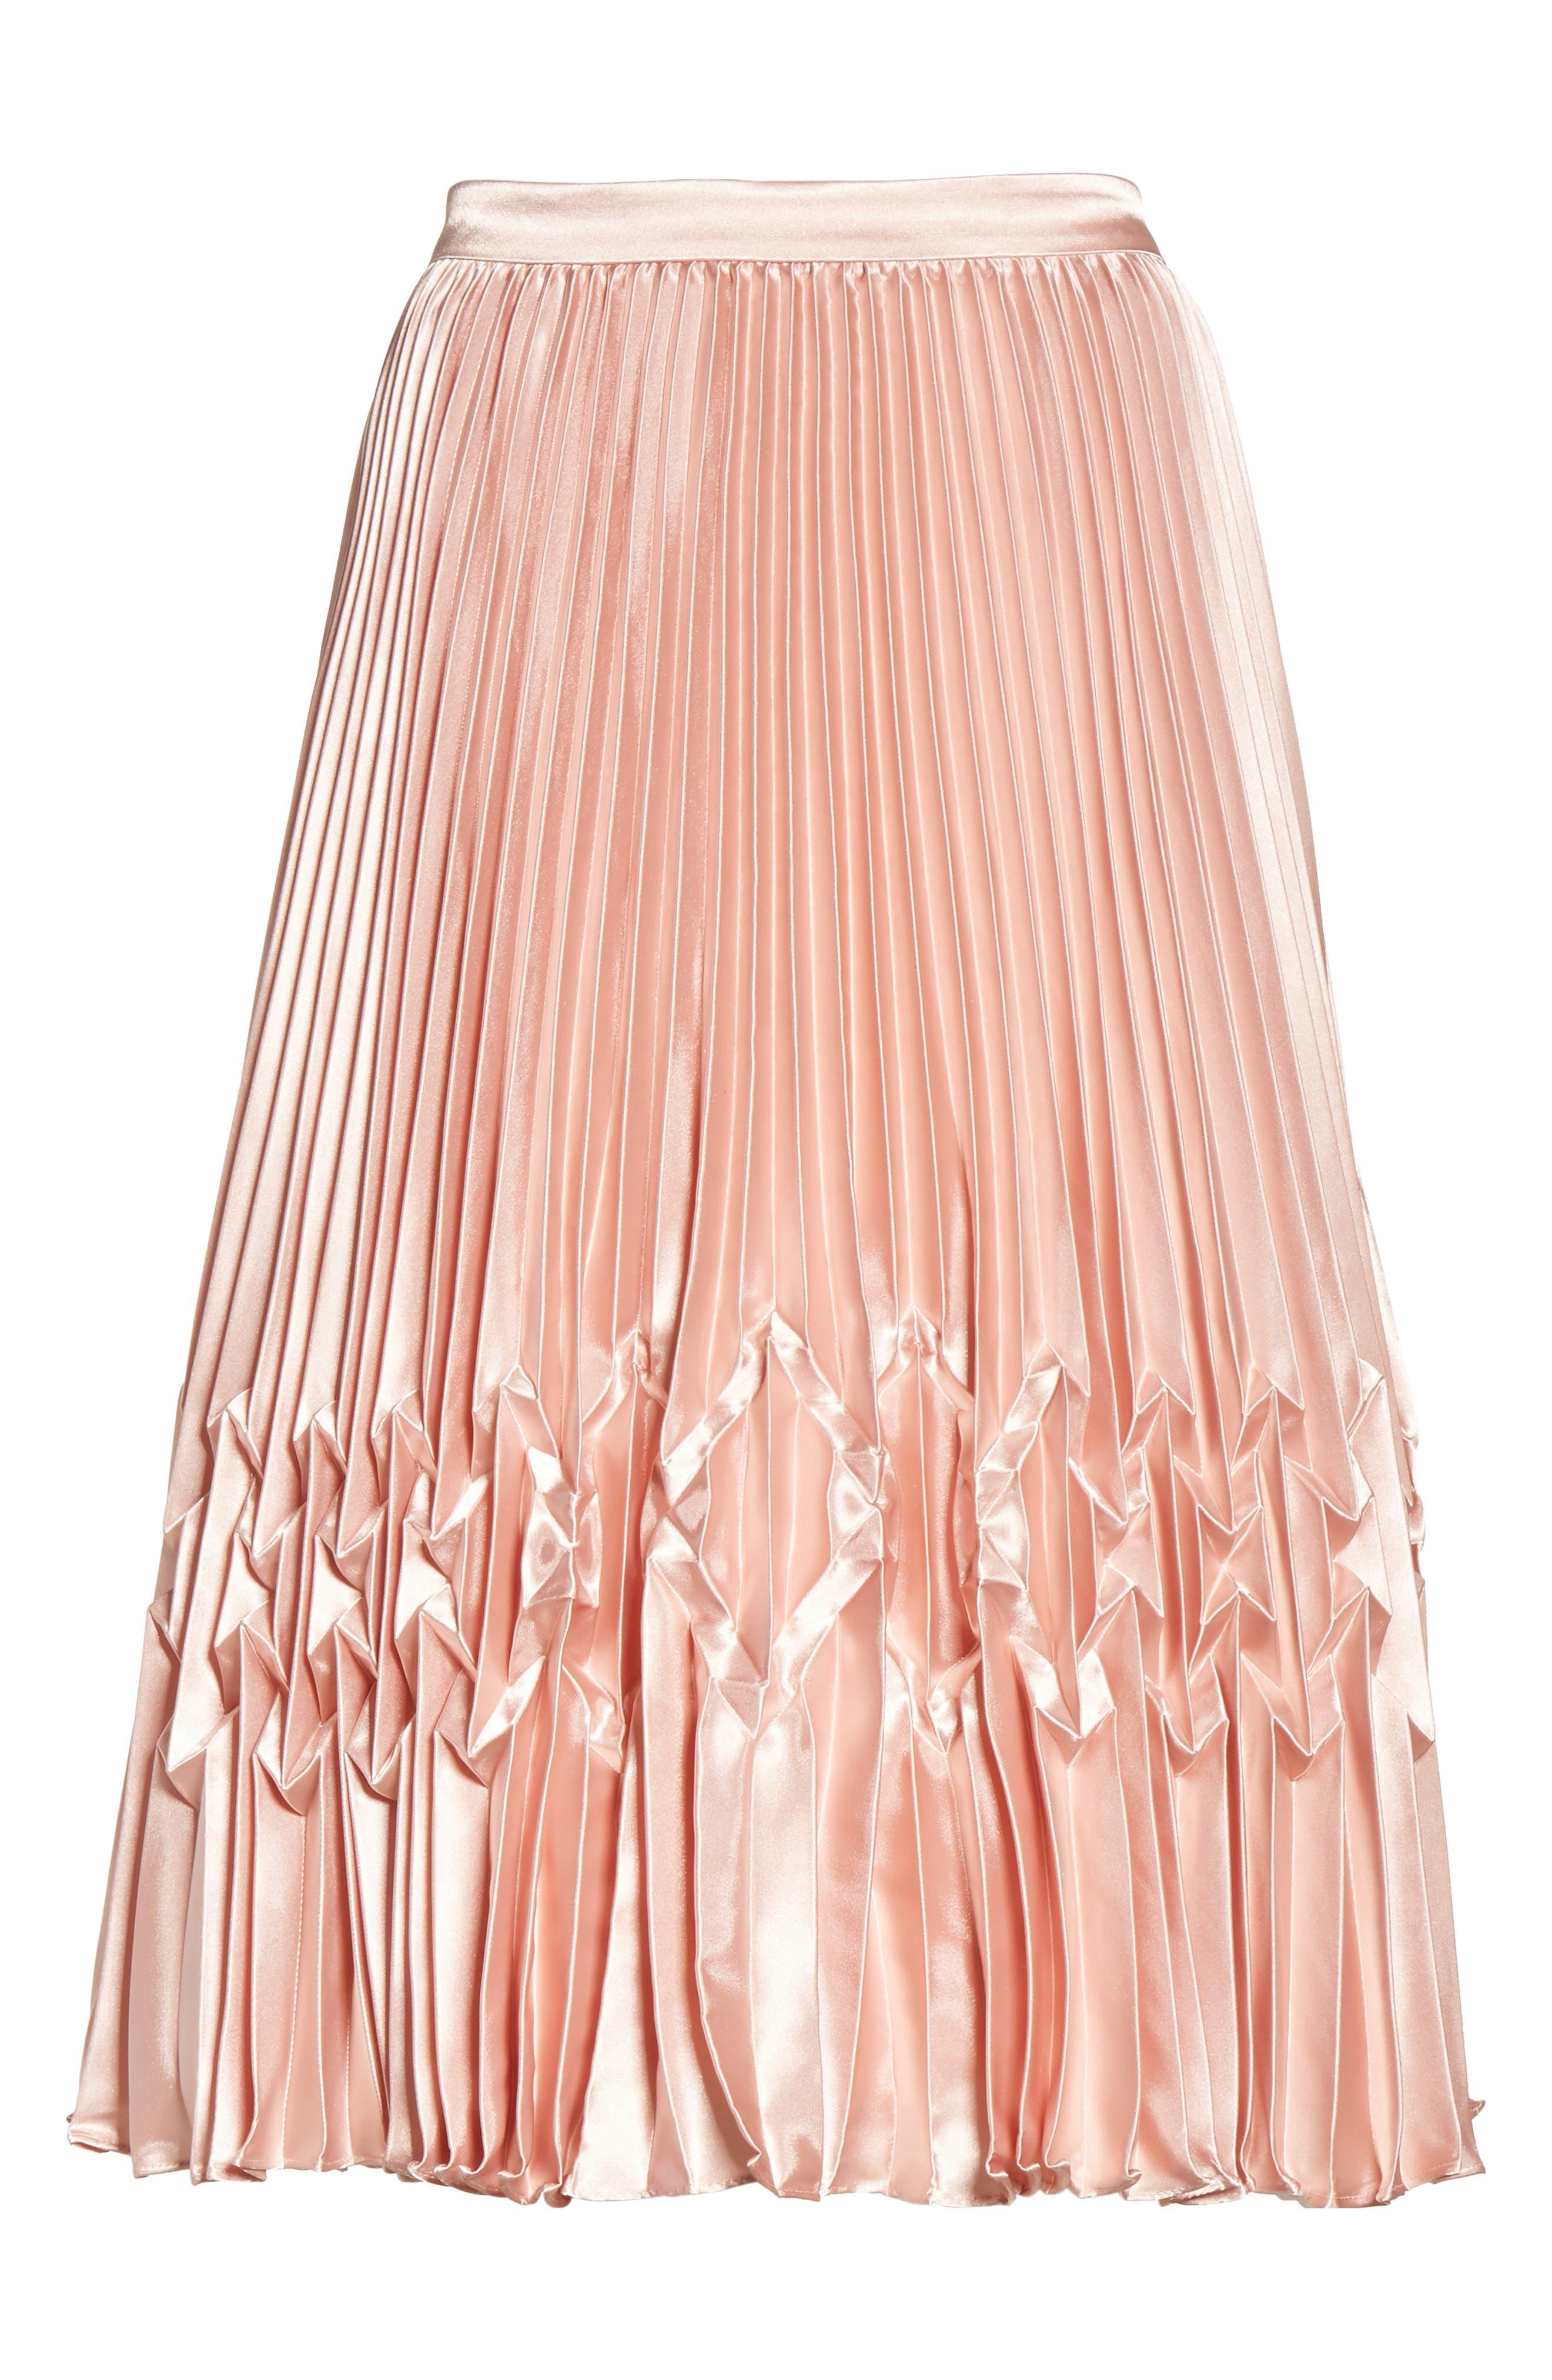 Zigzag Detail Pleated Midi Skirt,                             Alternate thumbnail 6, color,                             681